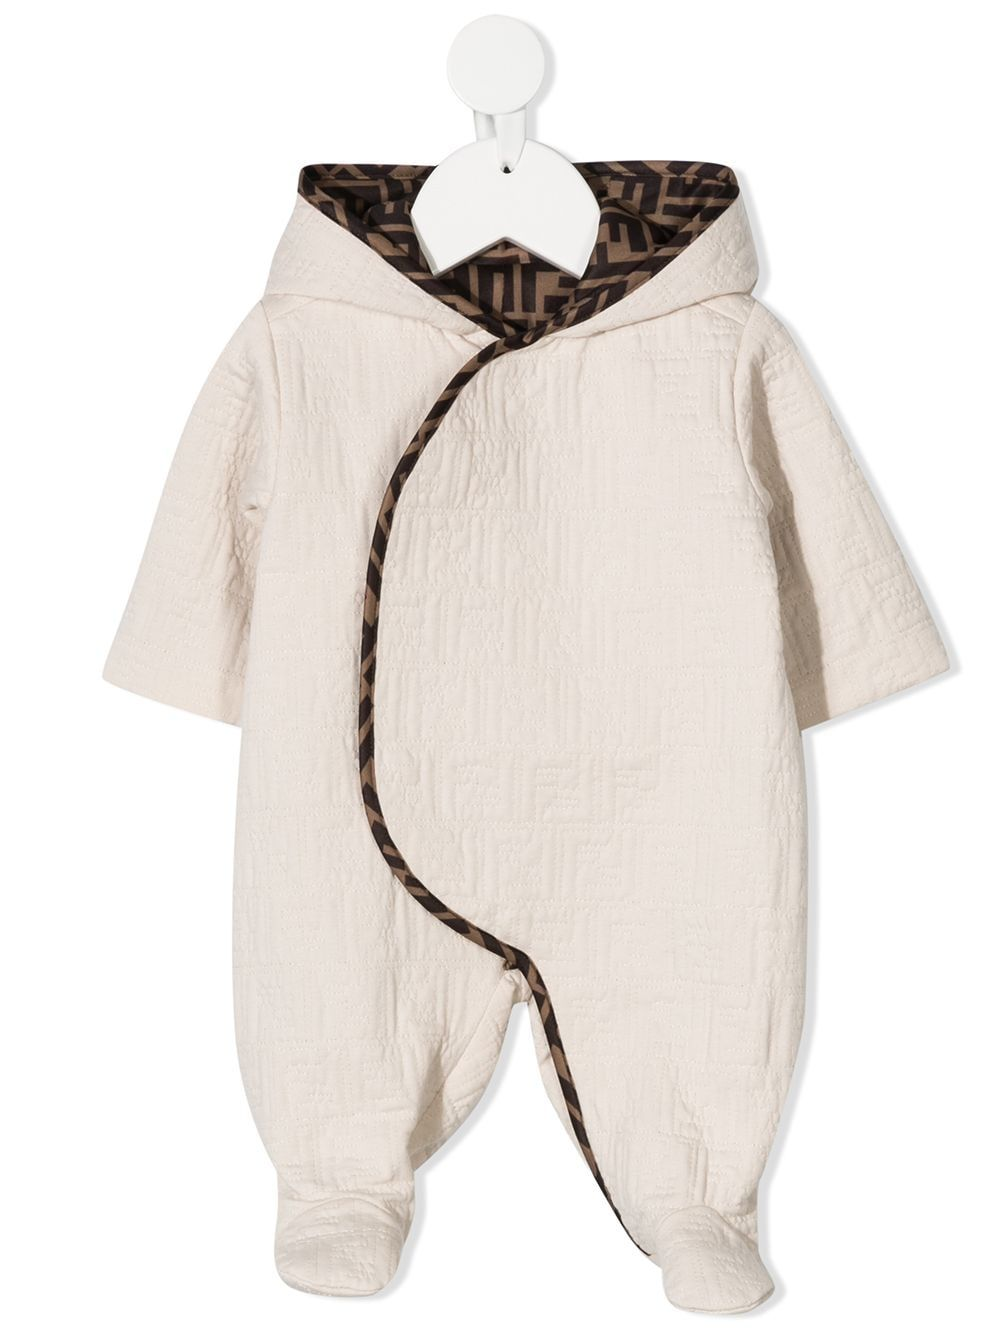 Fendi Kids FF logo lining pyjamas - Neutrals